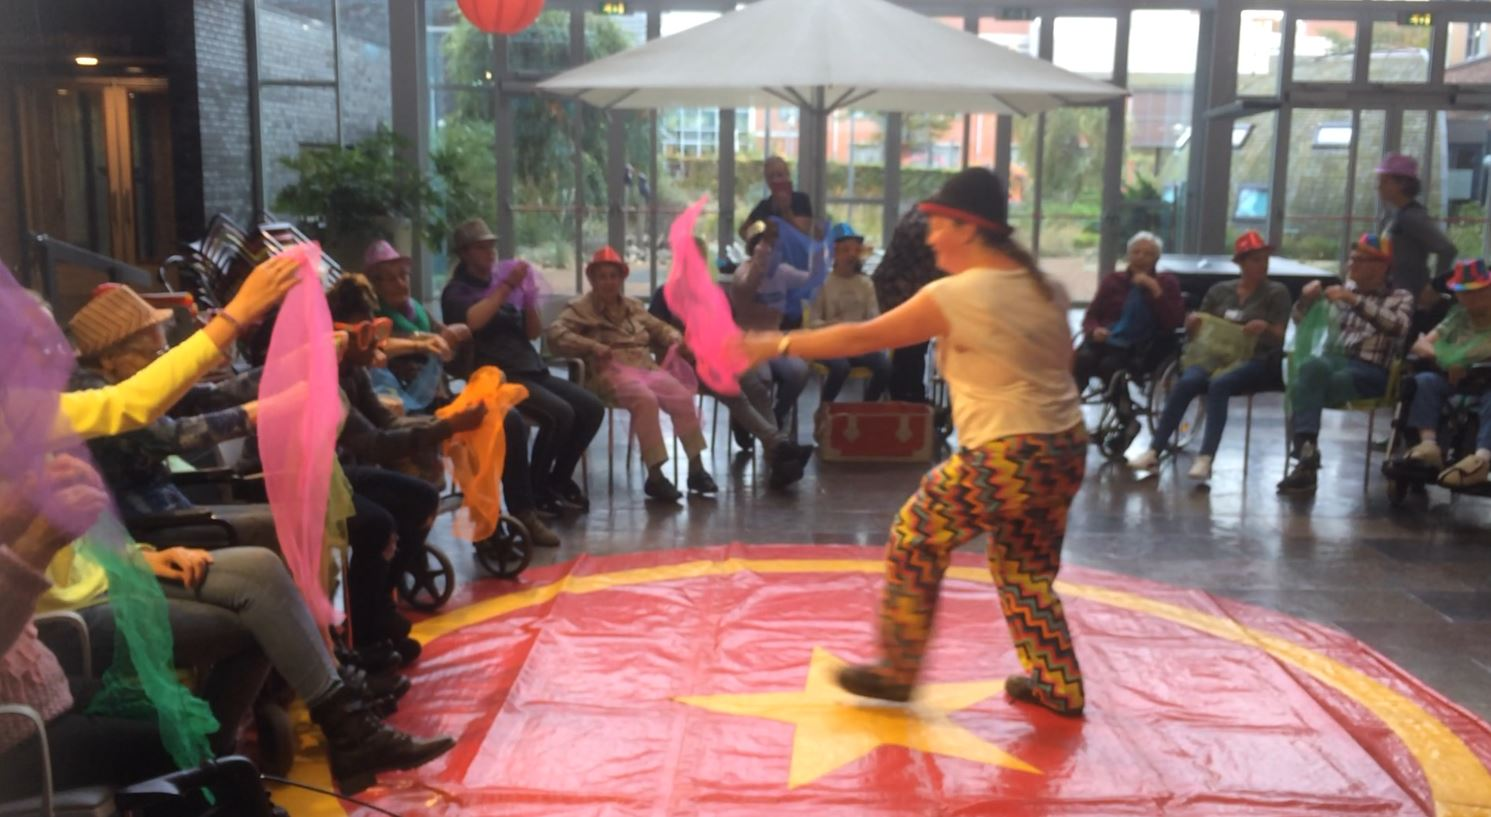 Circusthetaer Kiko - voorstelling Clown Kiko - speciaal circus voor speciale mensen